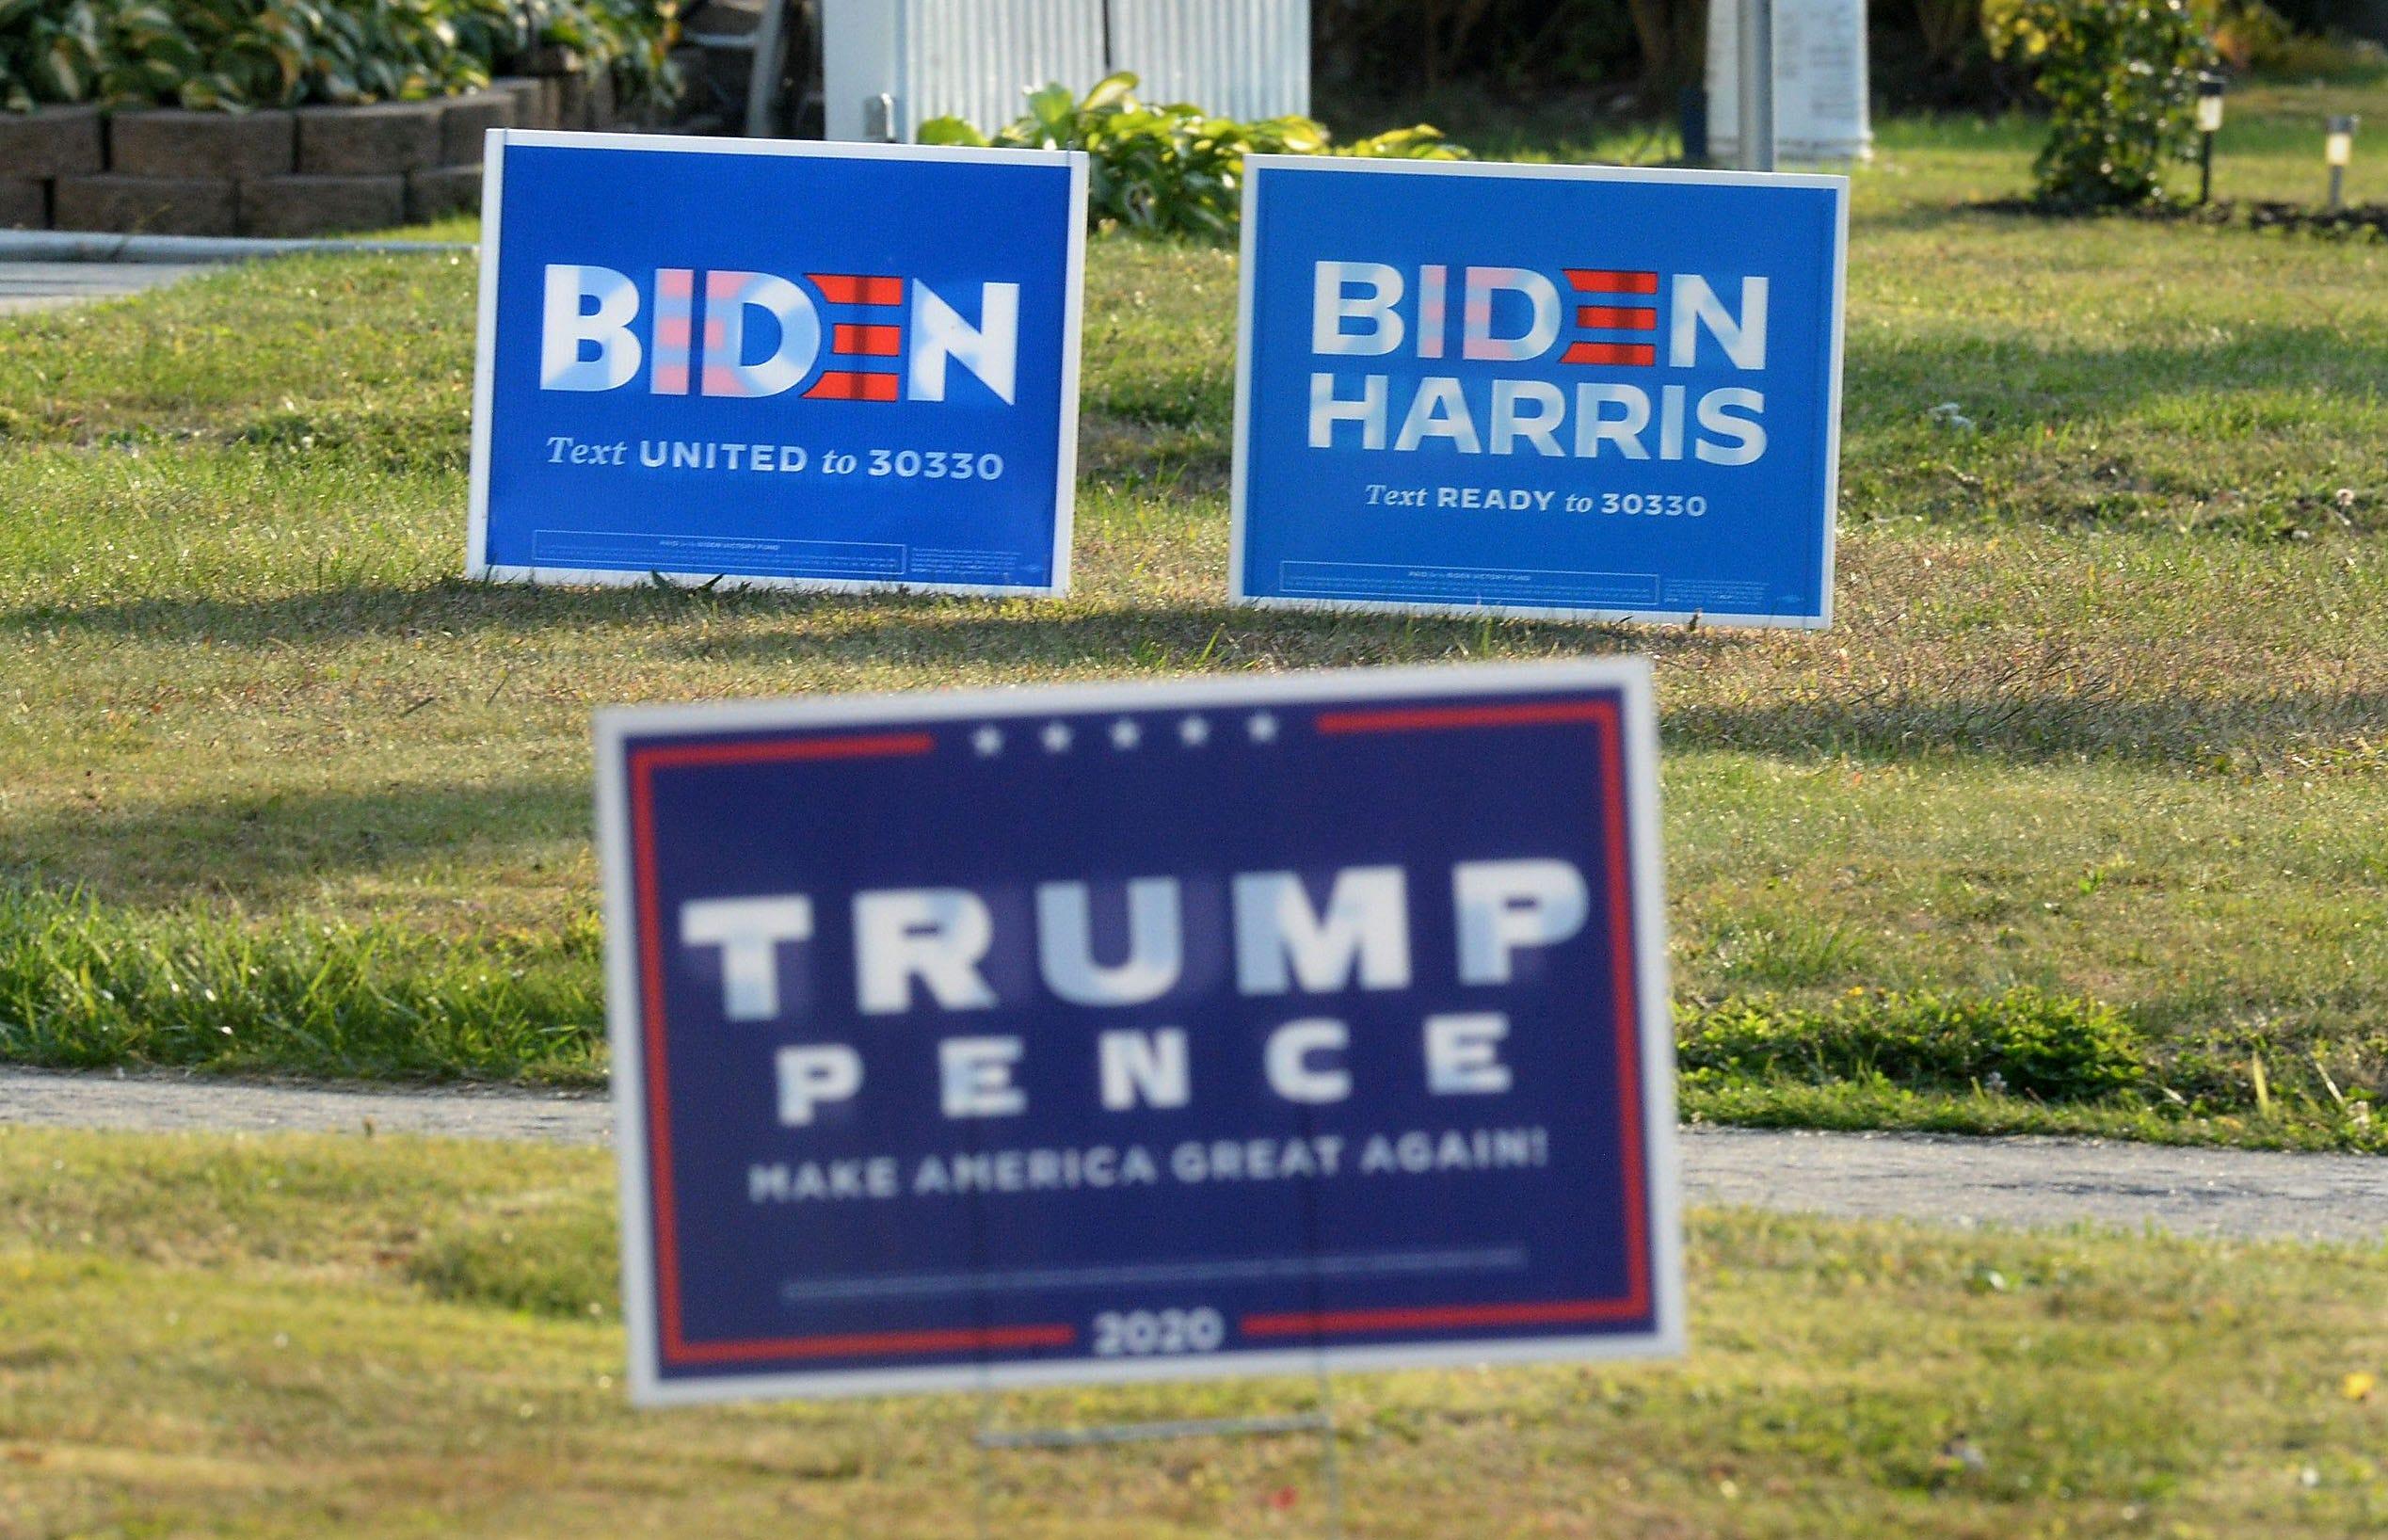 Biden Harris 2020 Vote for Biden USA President Elections Yard Sign